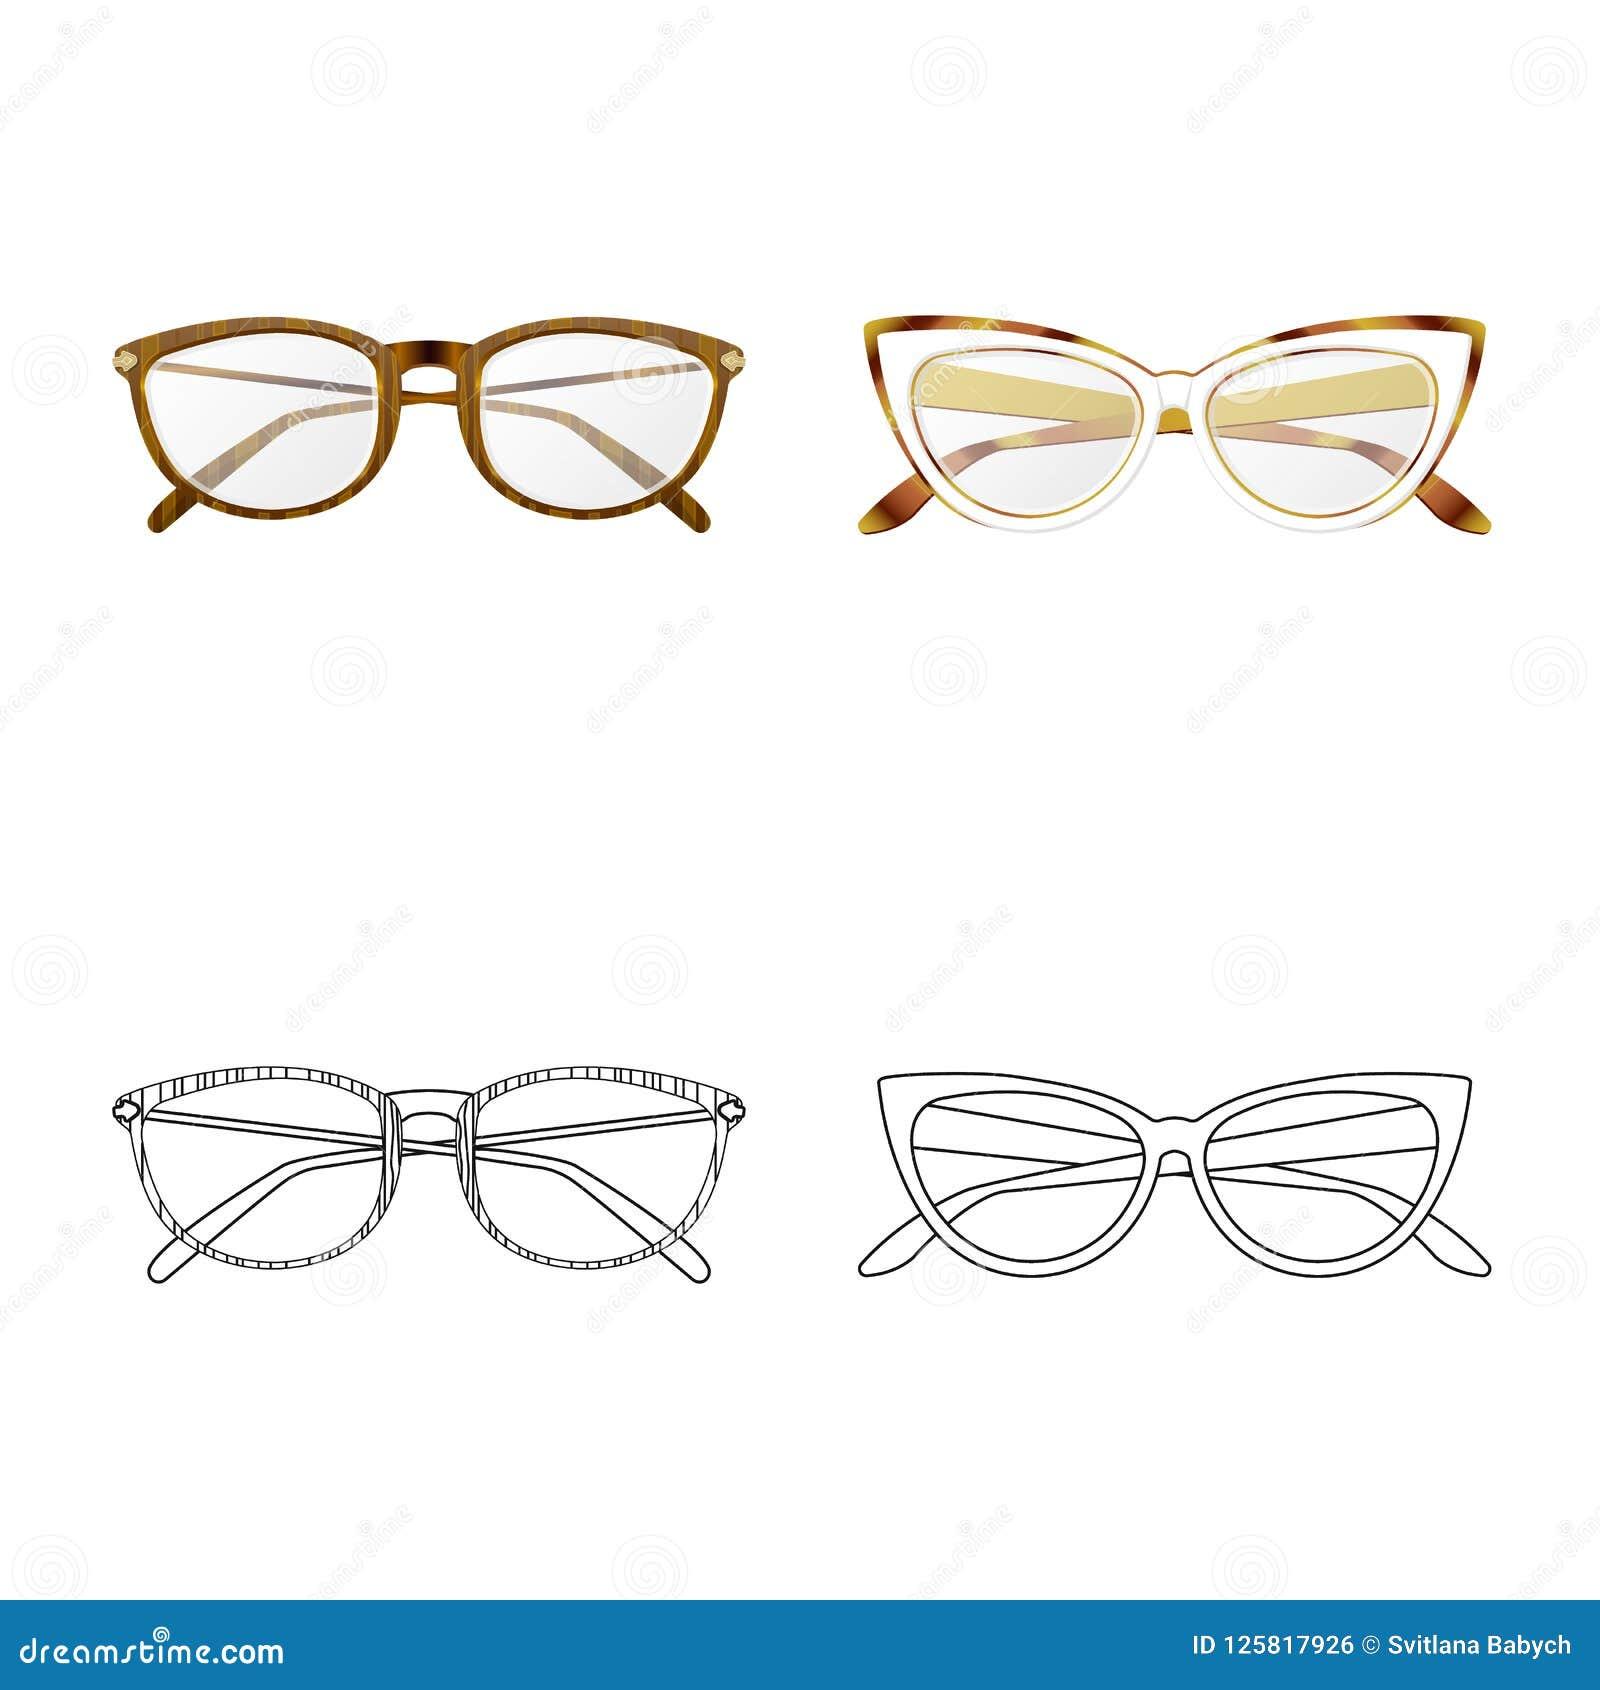 Vector Illustration Of Glasses And Frame Logo. Set Of Glasses And ...